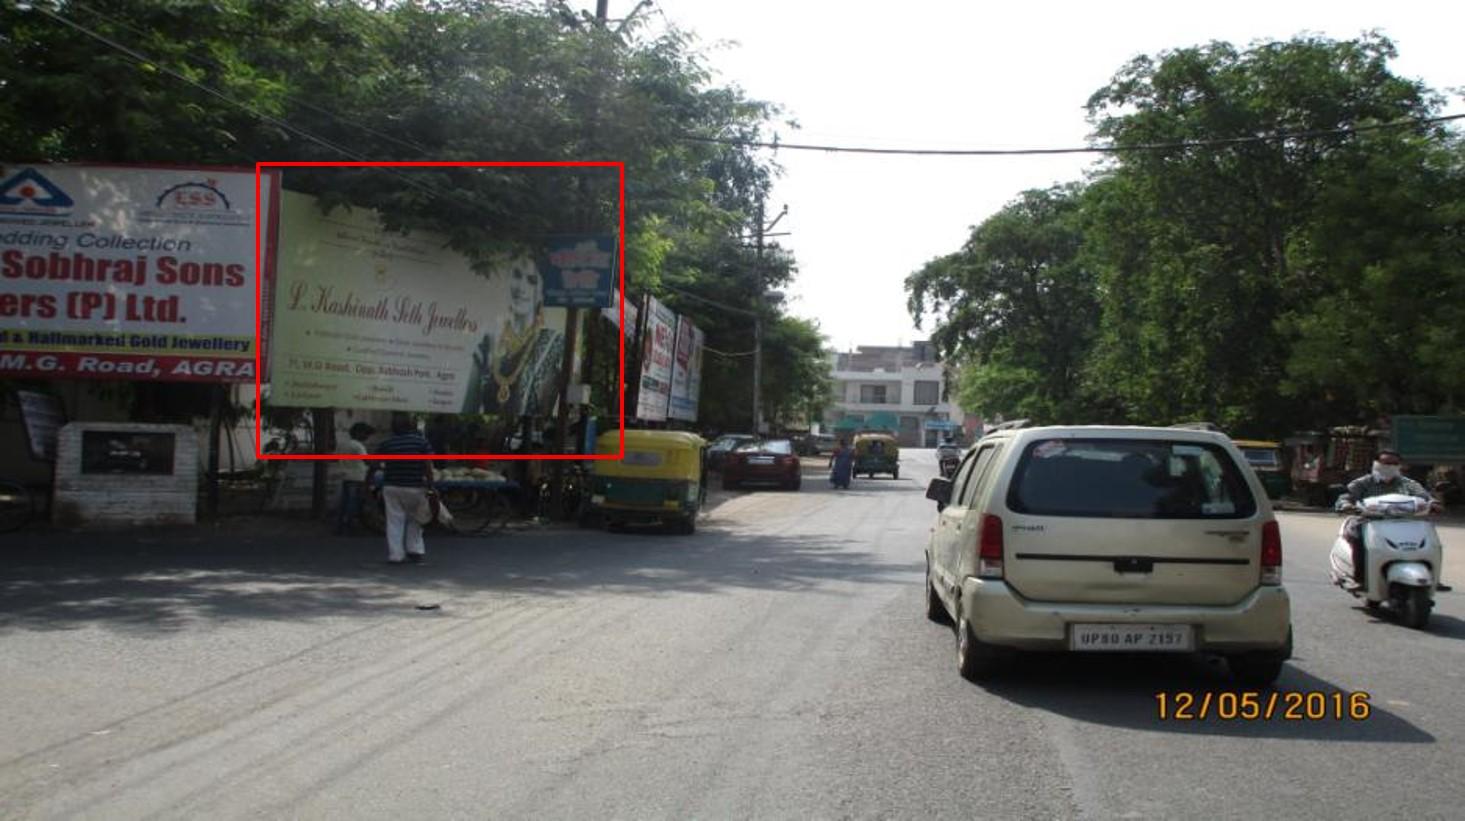 Church Road Turn, Agra